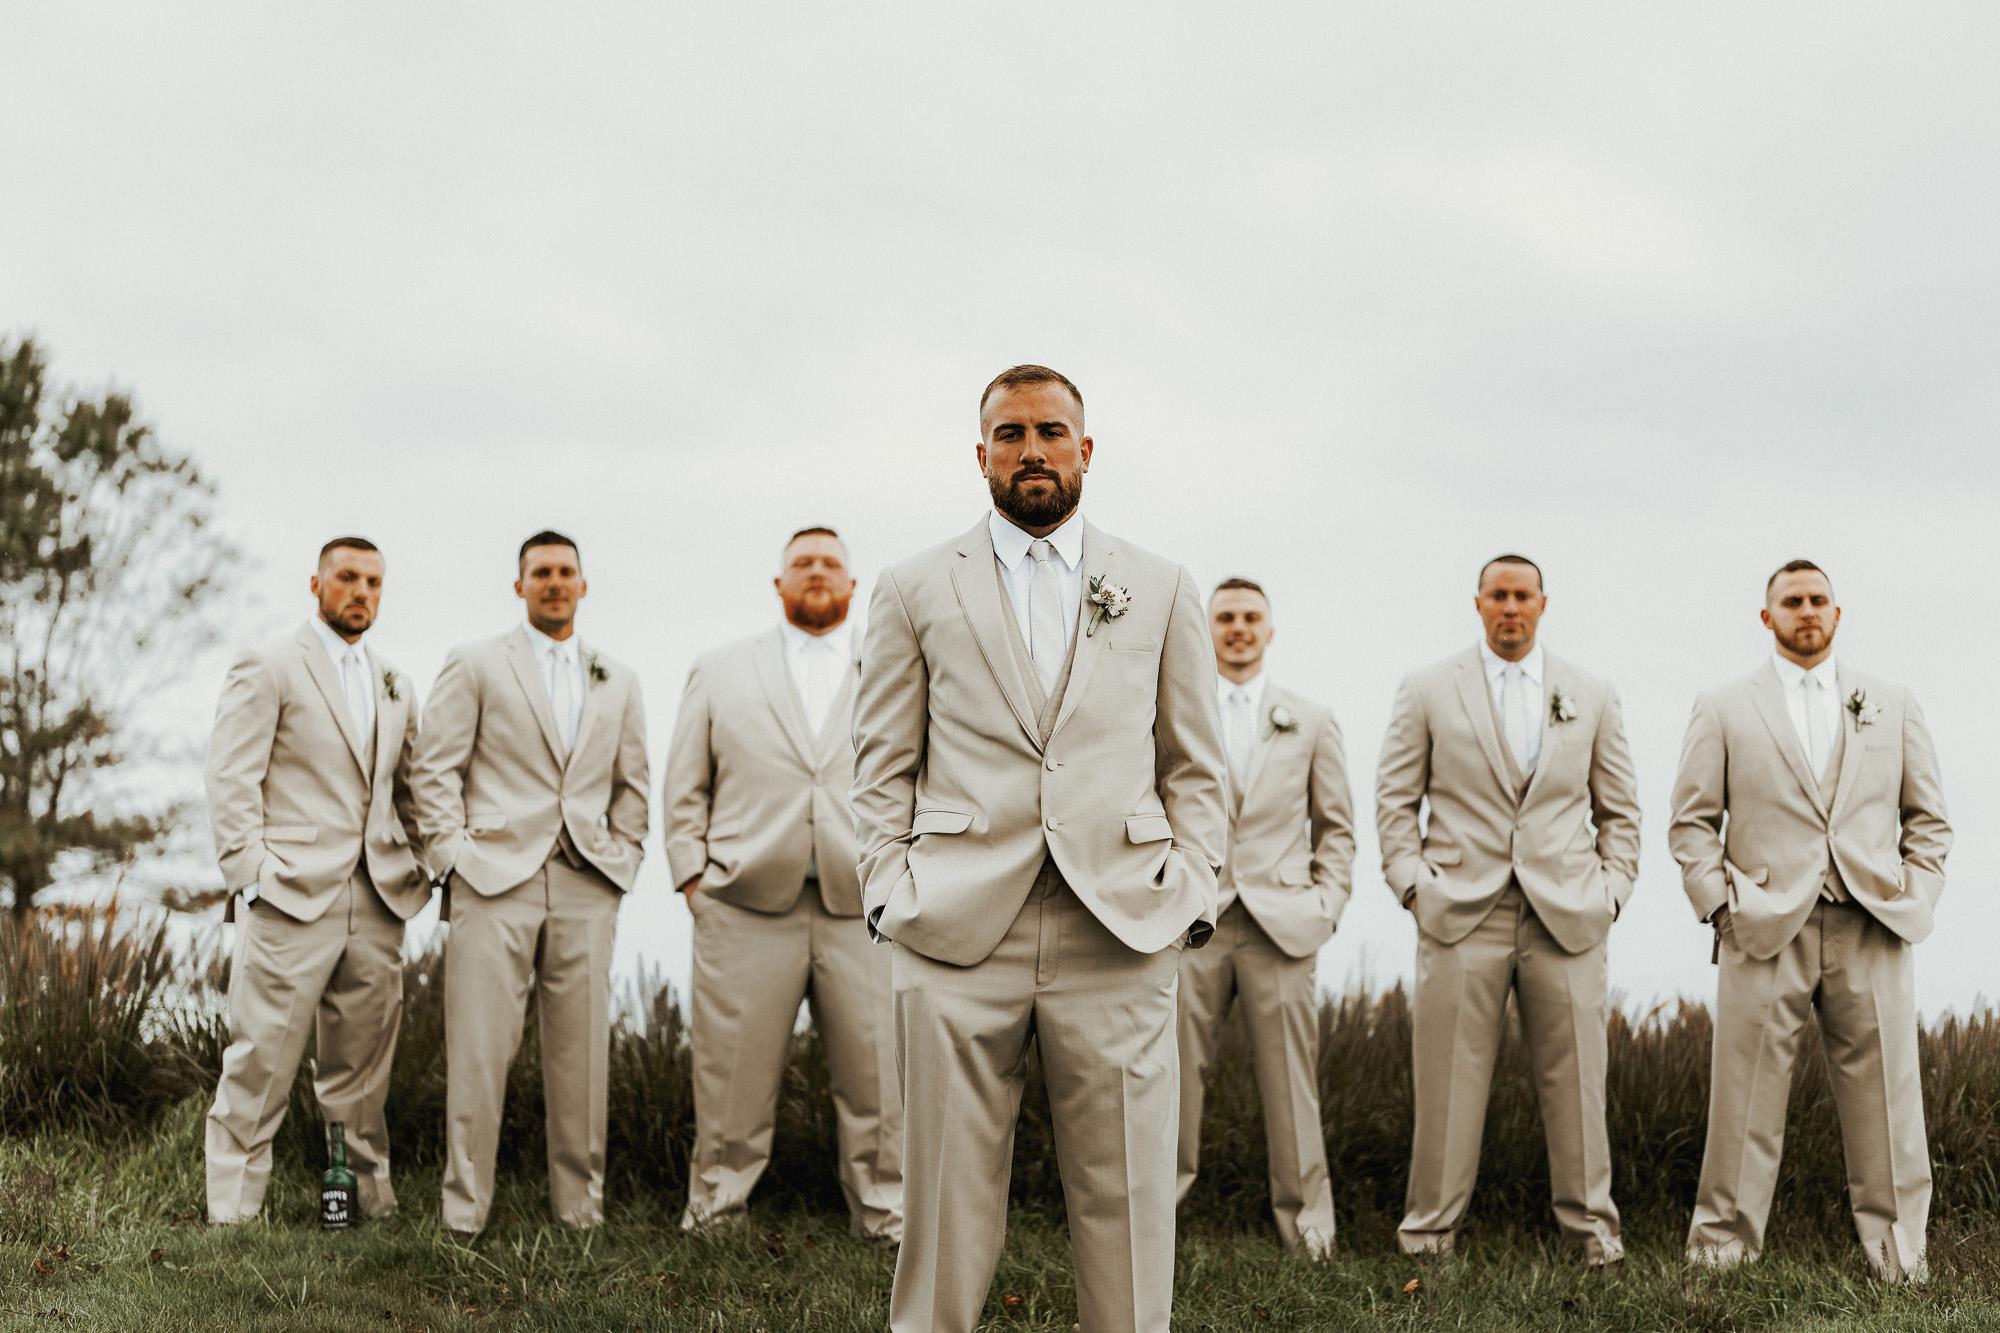 Our Wedding Photos | Pine Barren Beauty | wedding photo inspiration, bridal party colors, bridal party photos